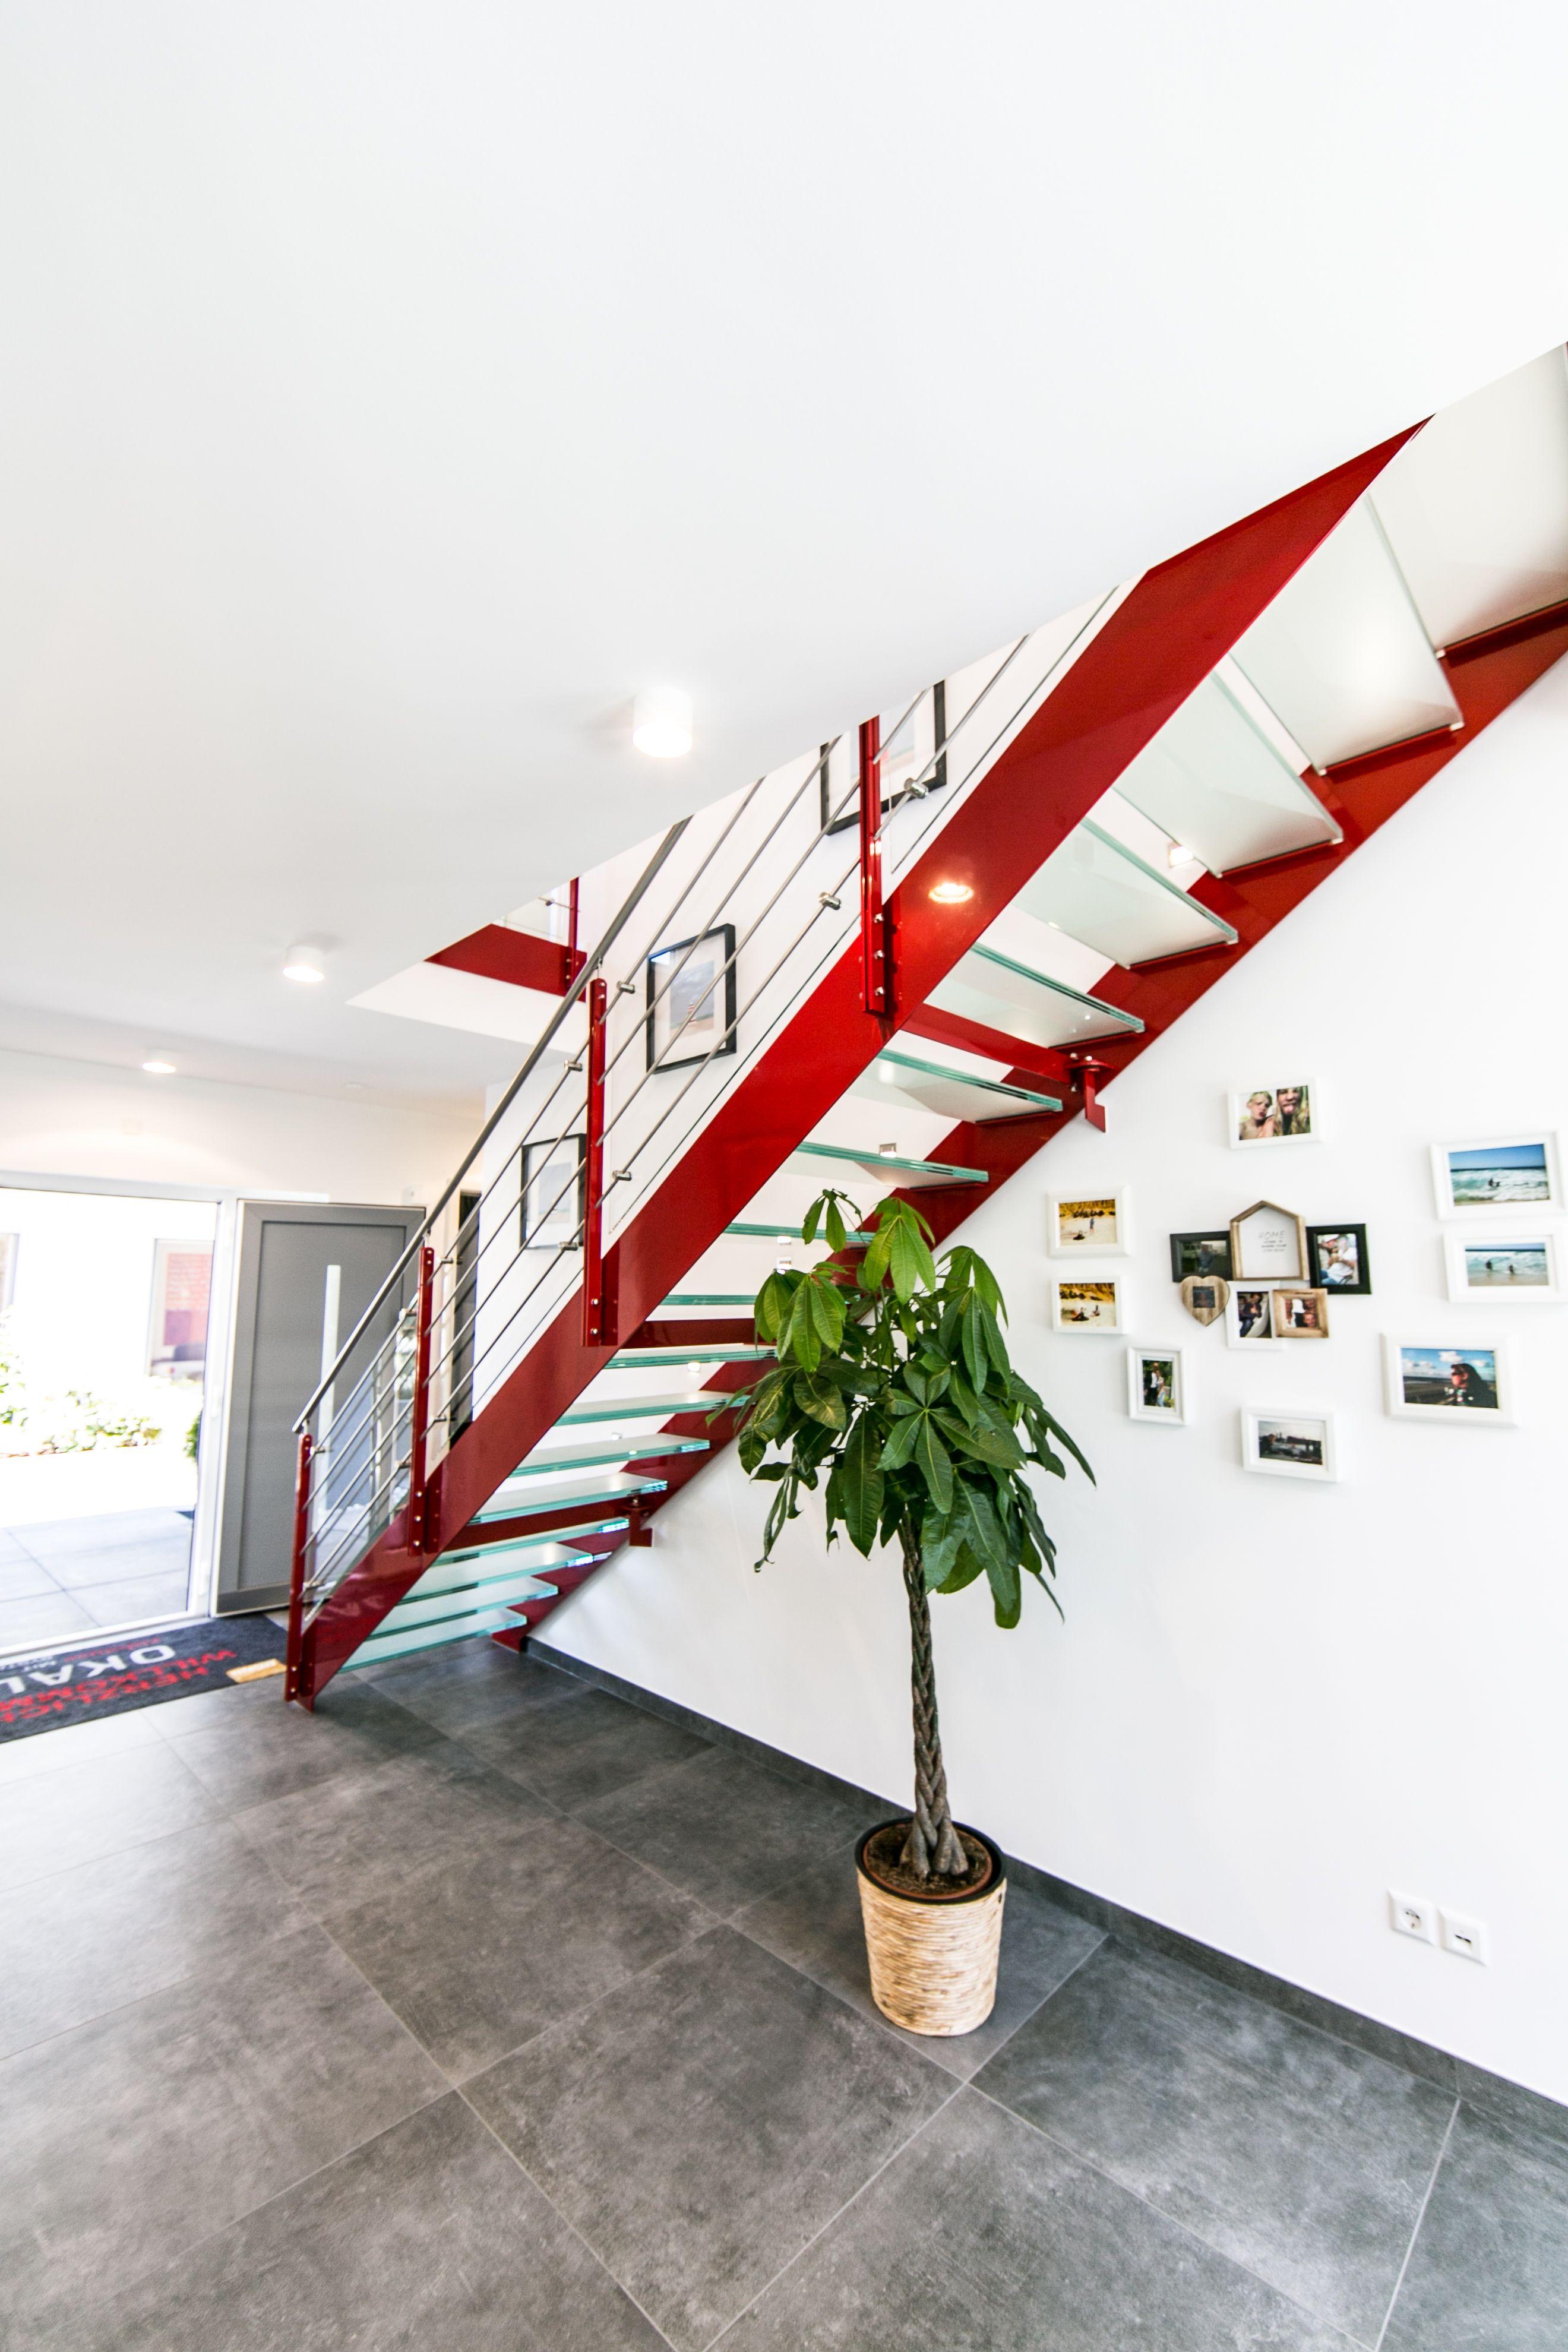 Bauunternehmen Offenburg okal musterhaus offenburg treppe okal flur garderobe